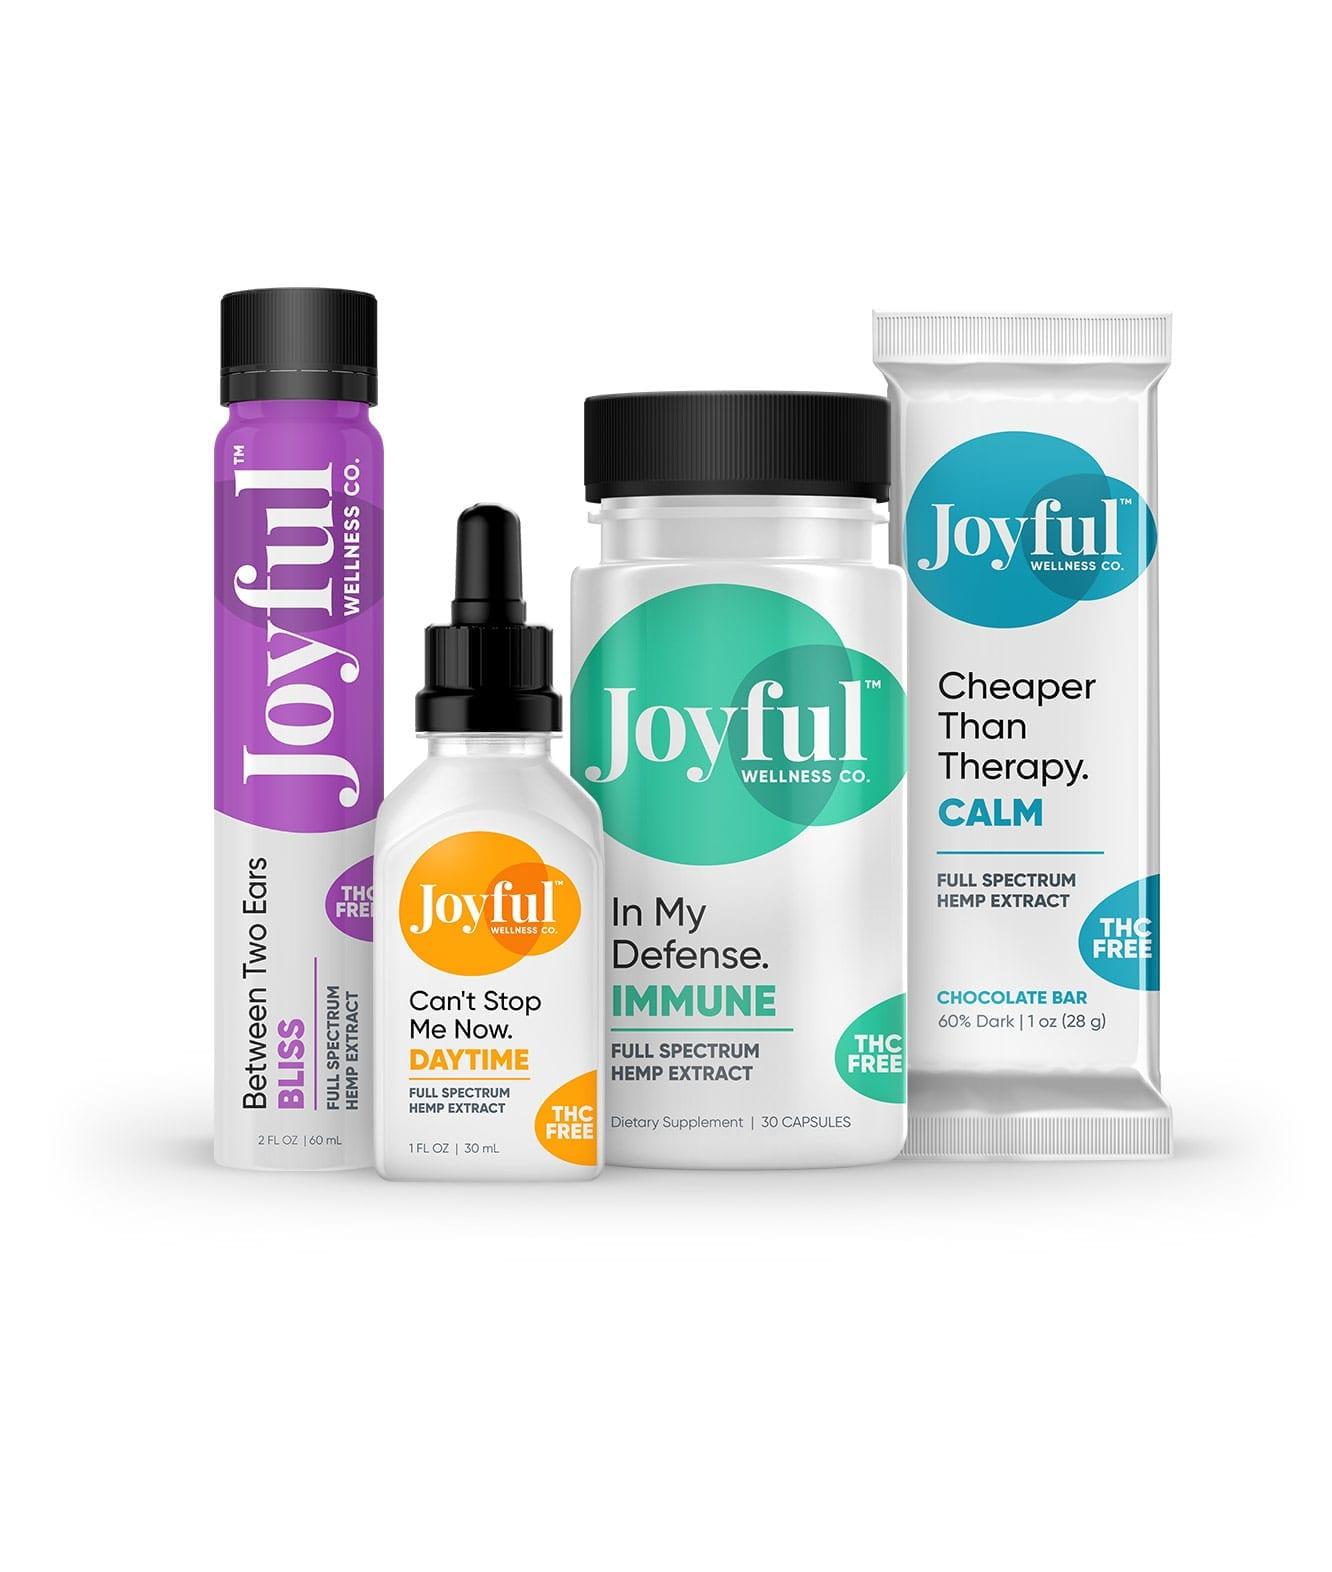 joyful wellness packaging designer